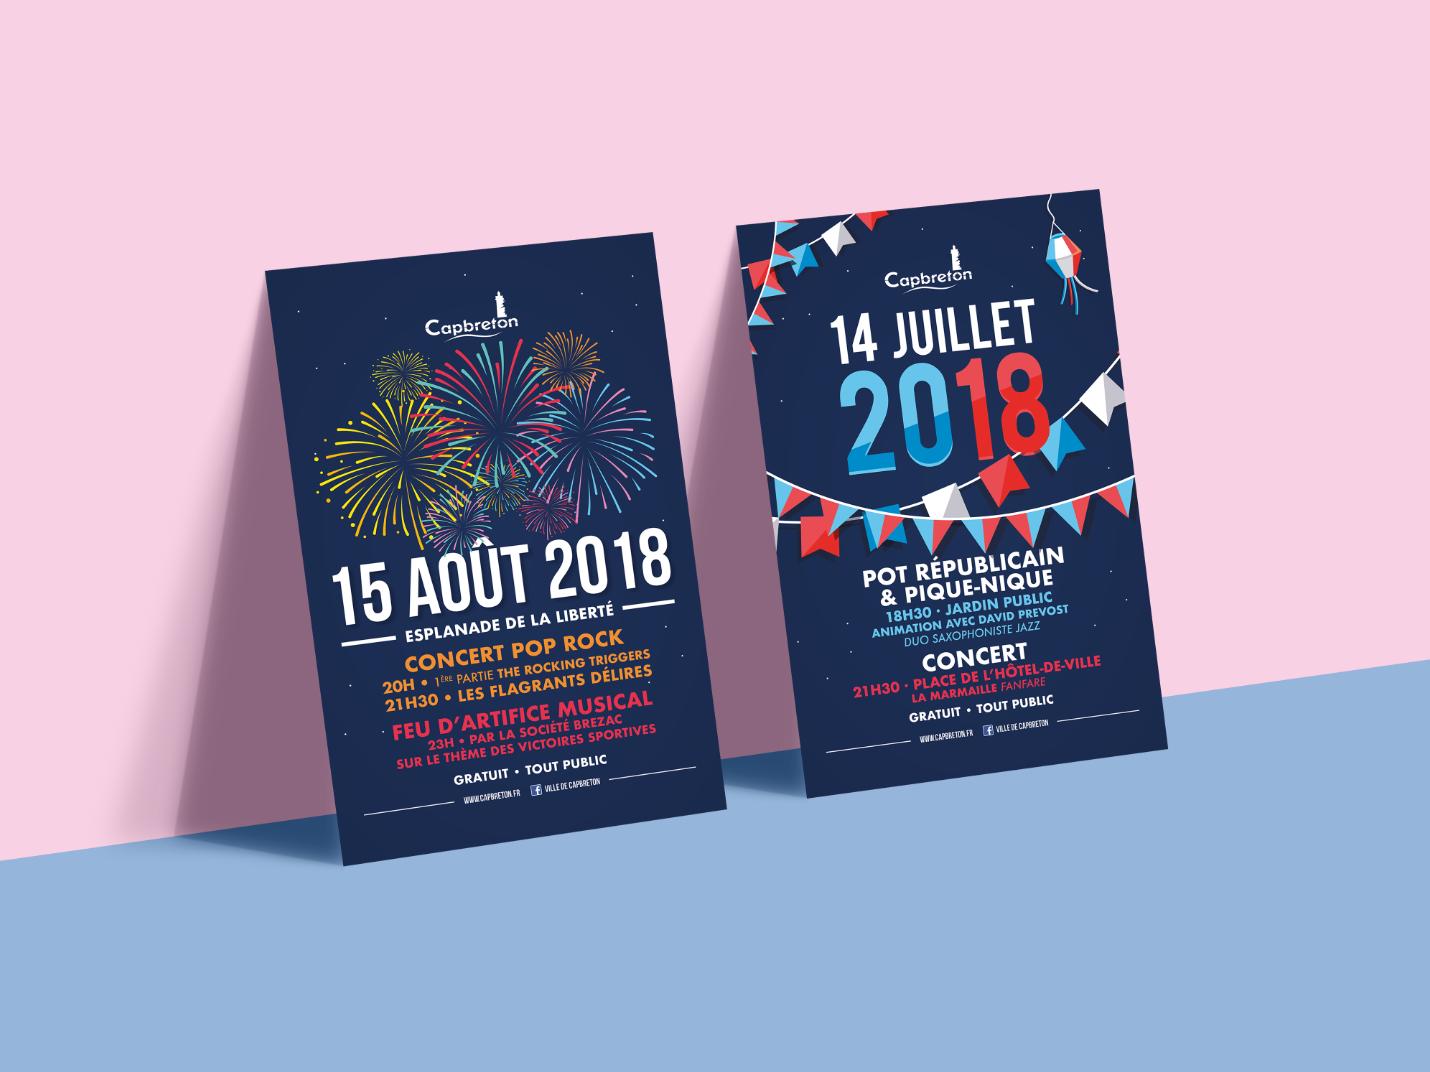 14 juillet 15 aout 2018 Capbreton